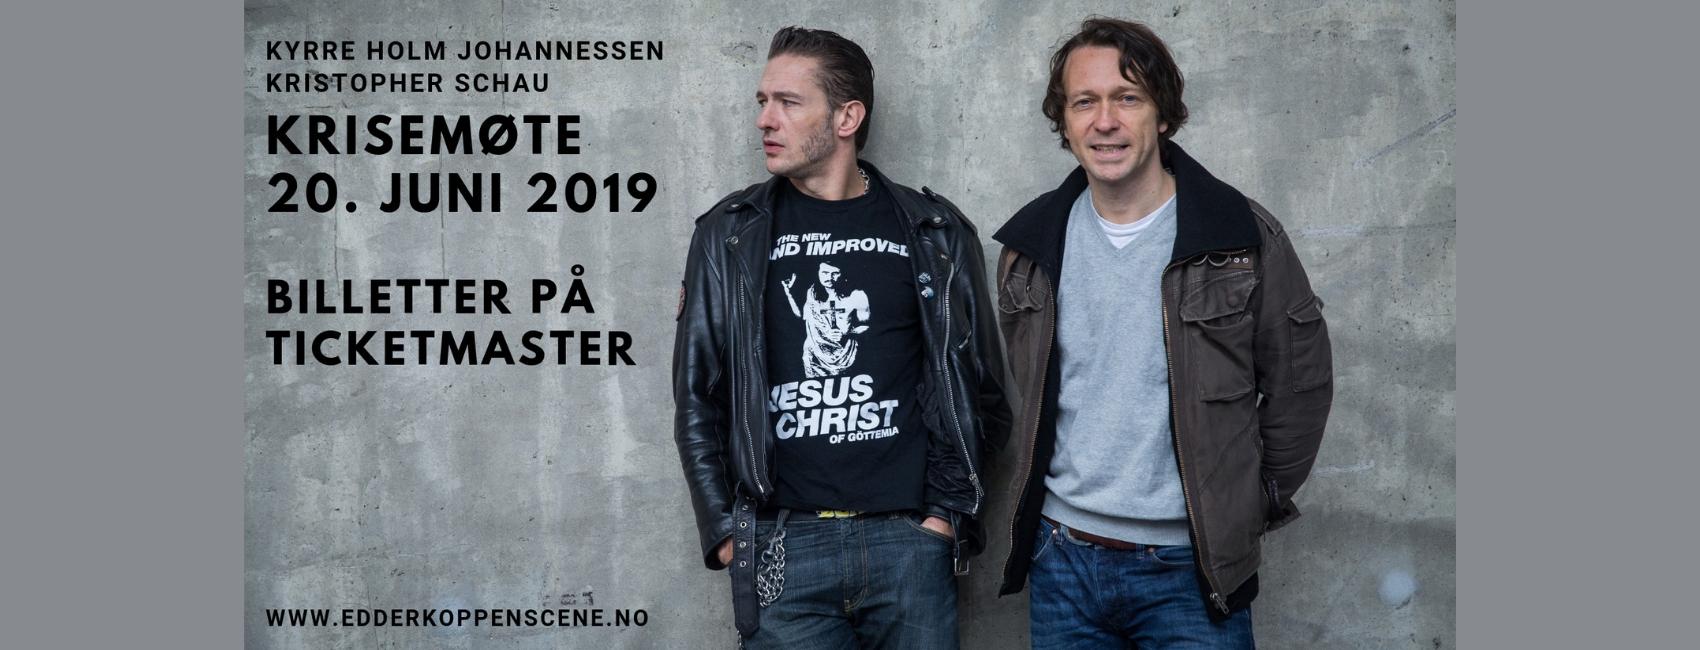 Krisemøte-Edderkoppen-Scene-Kyrre-Holm-Johannessen-Kristopher-Schau